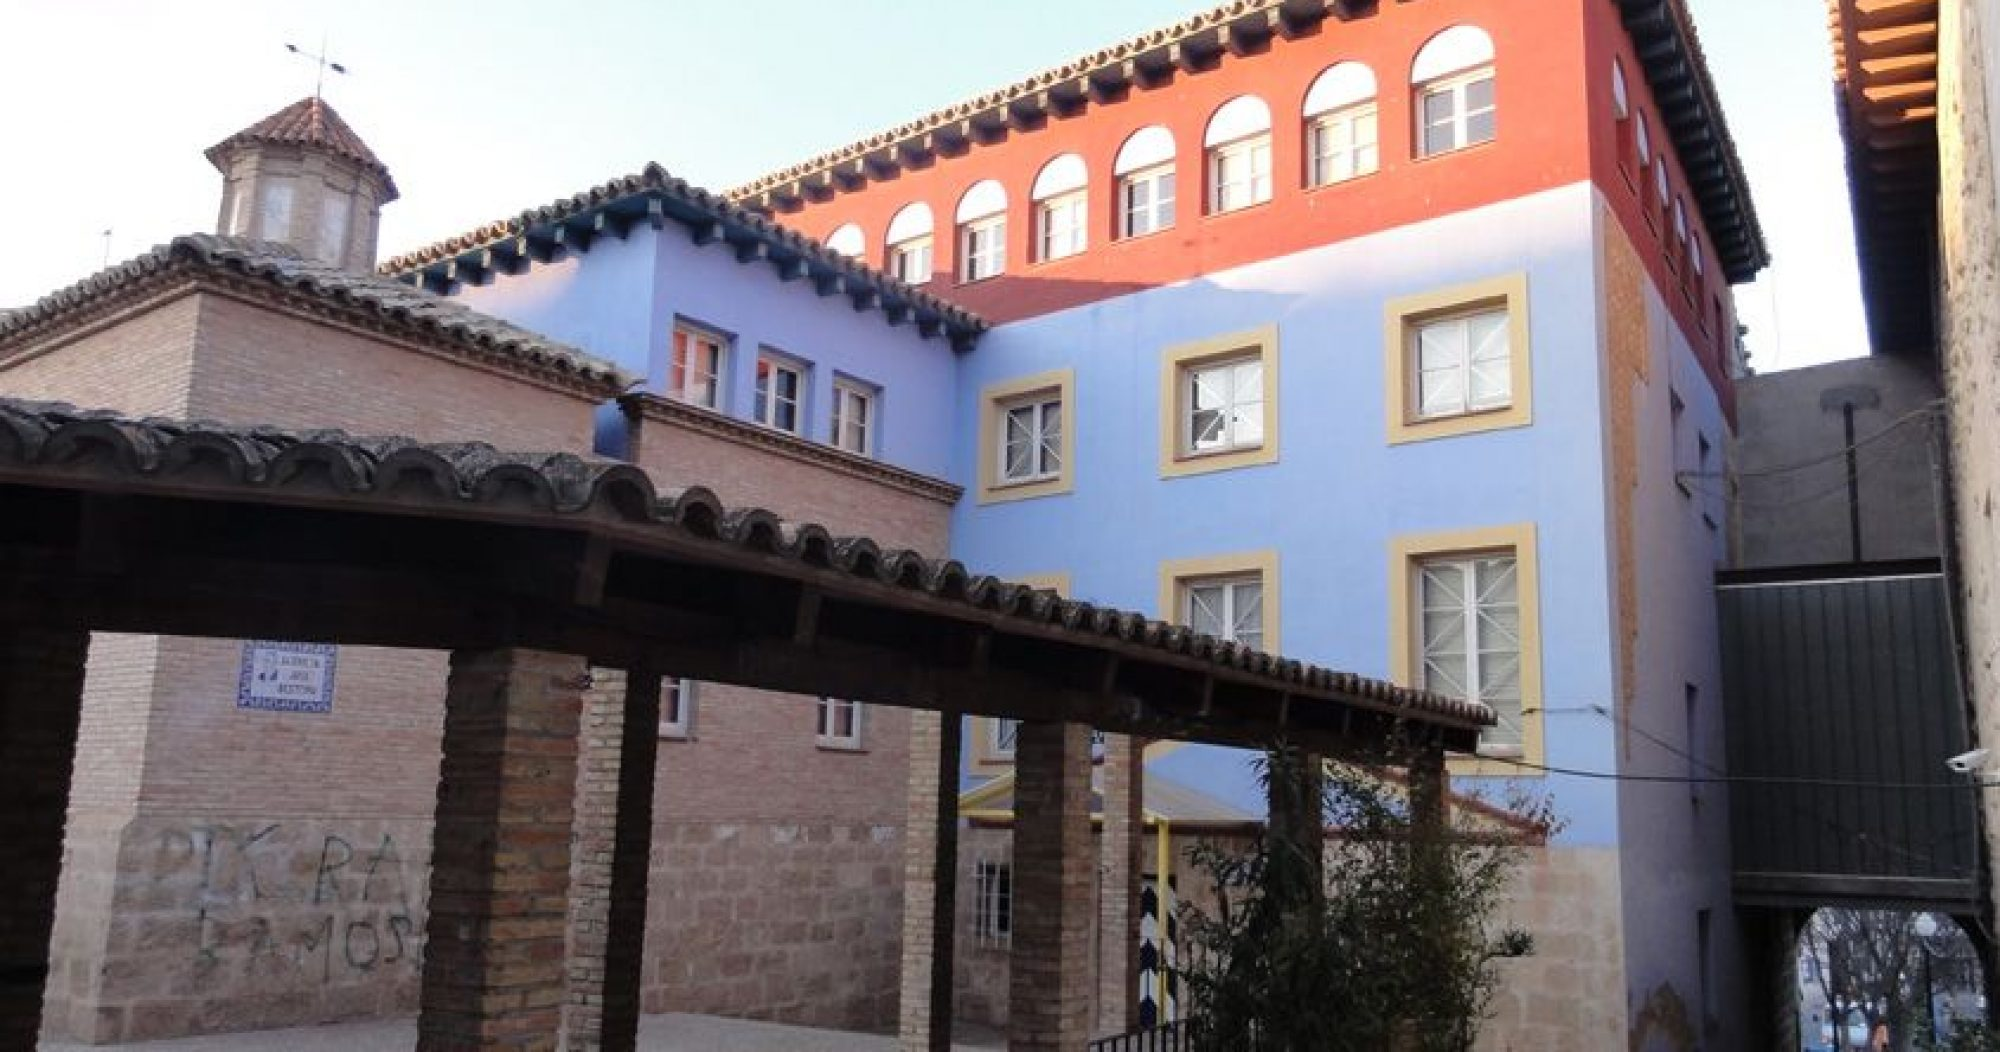 Biblioteca Pública Municipal de Caspe